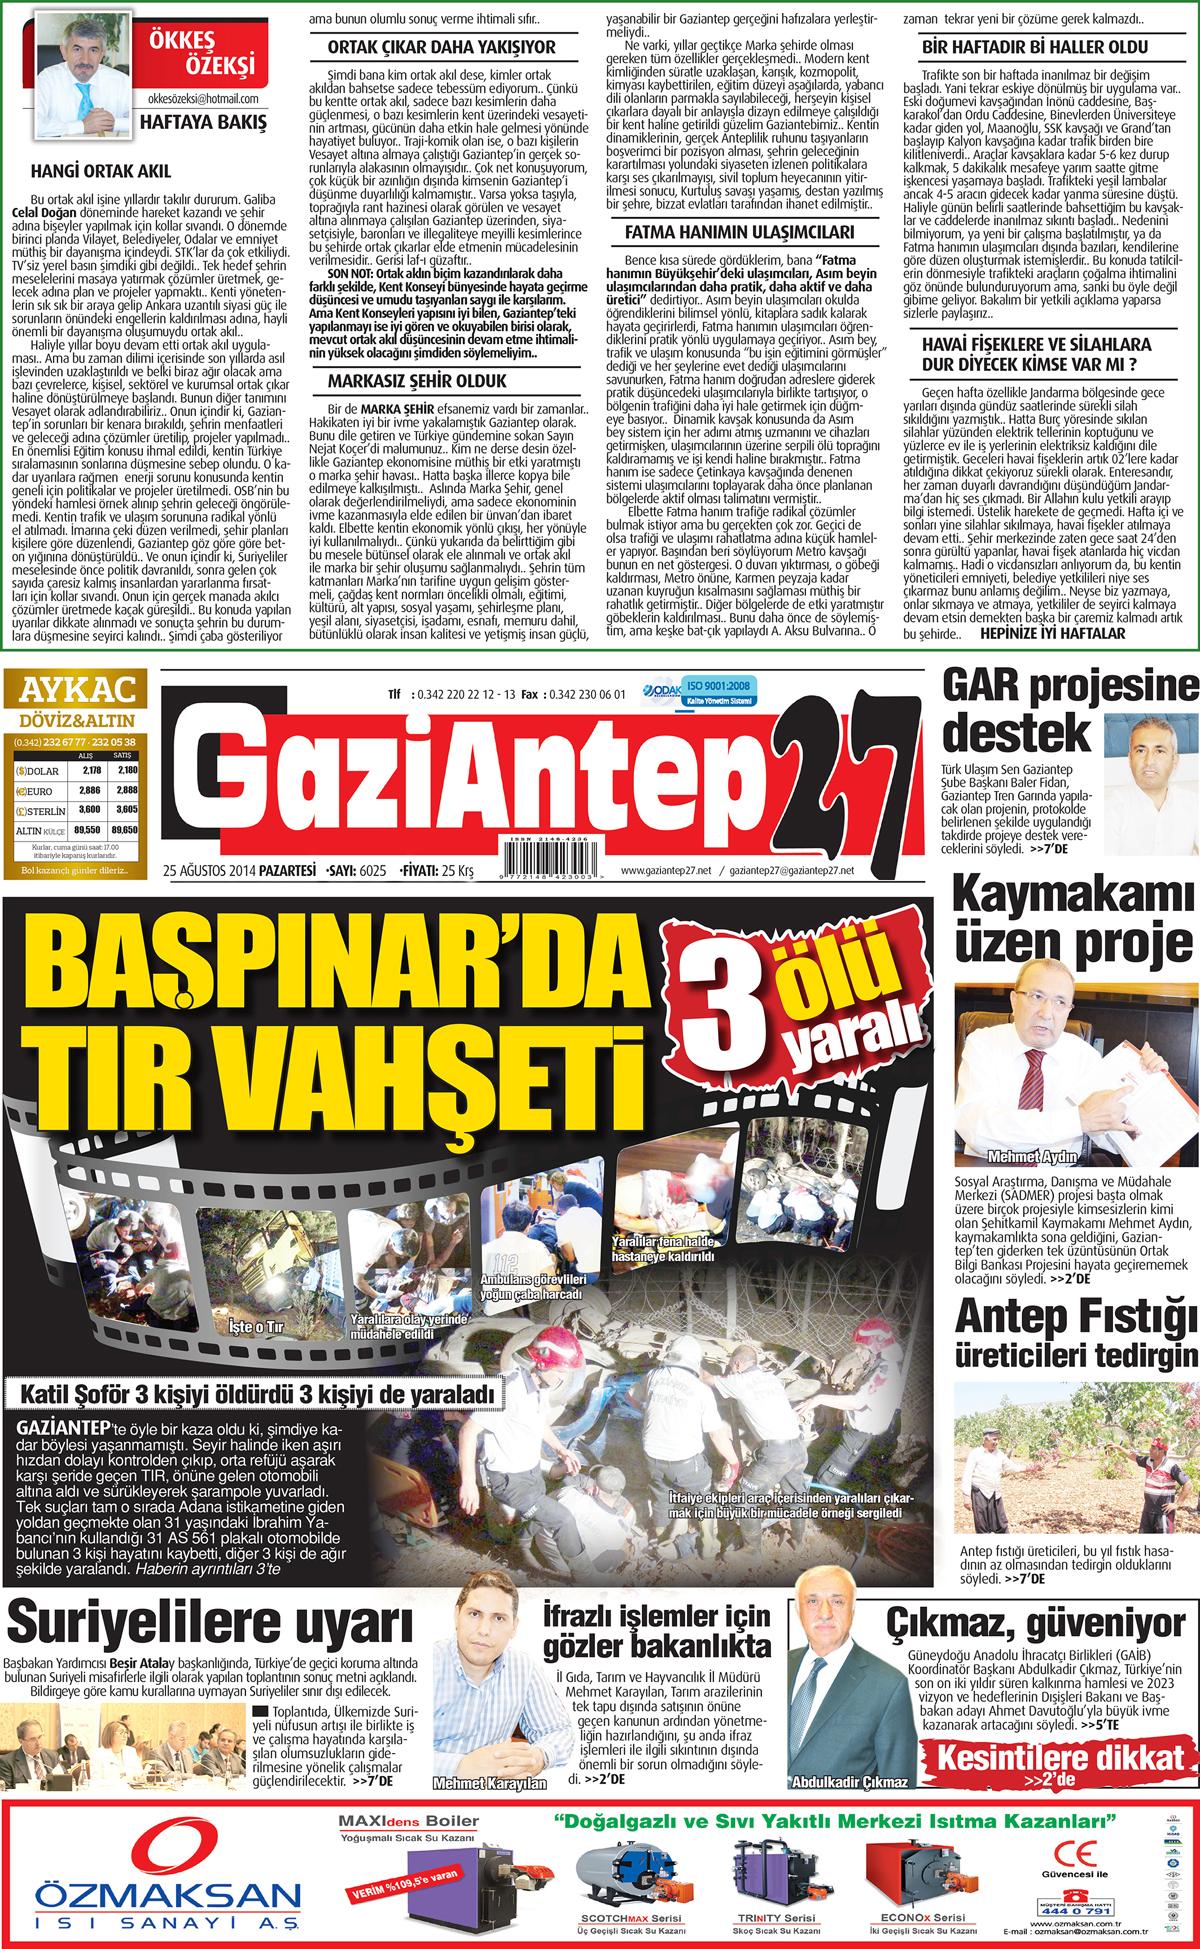 25 AĞUSTOS 2014 PAZARTESİ SAYFALARI 1